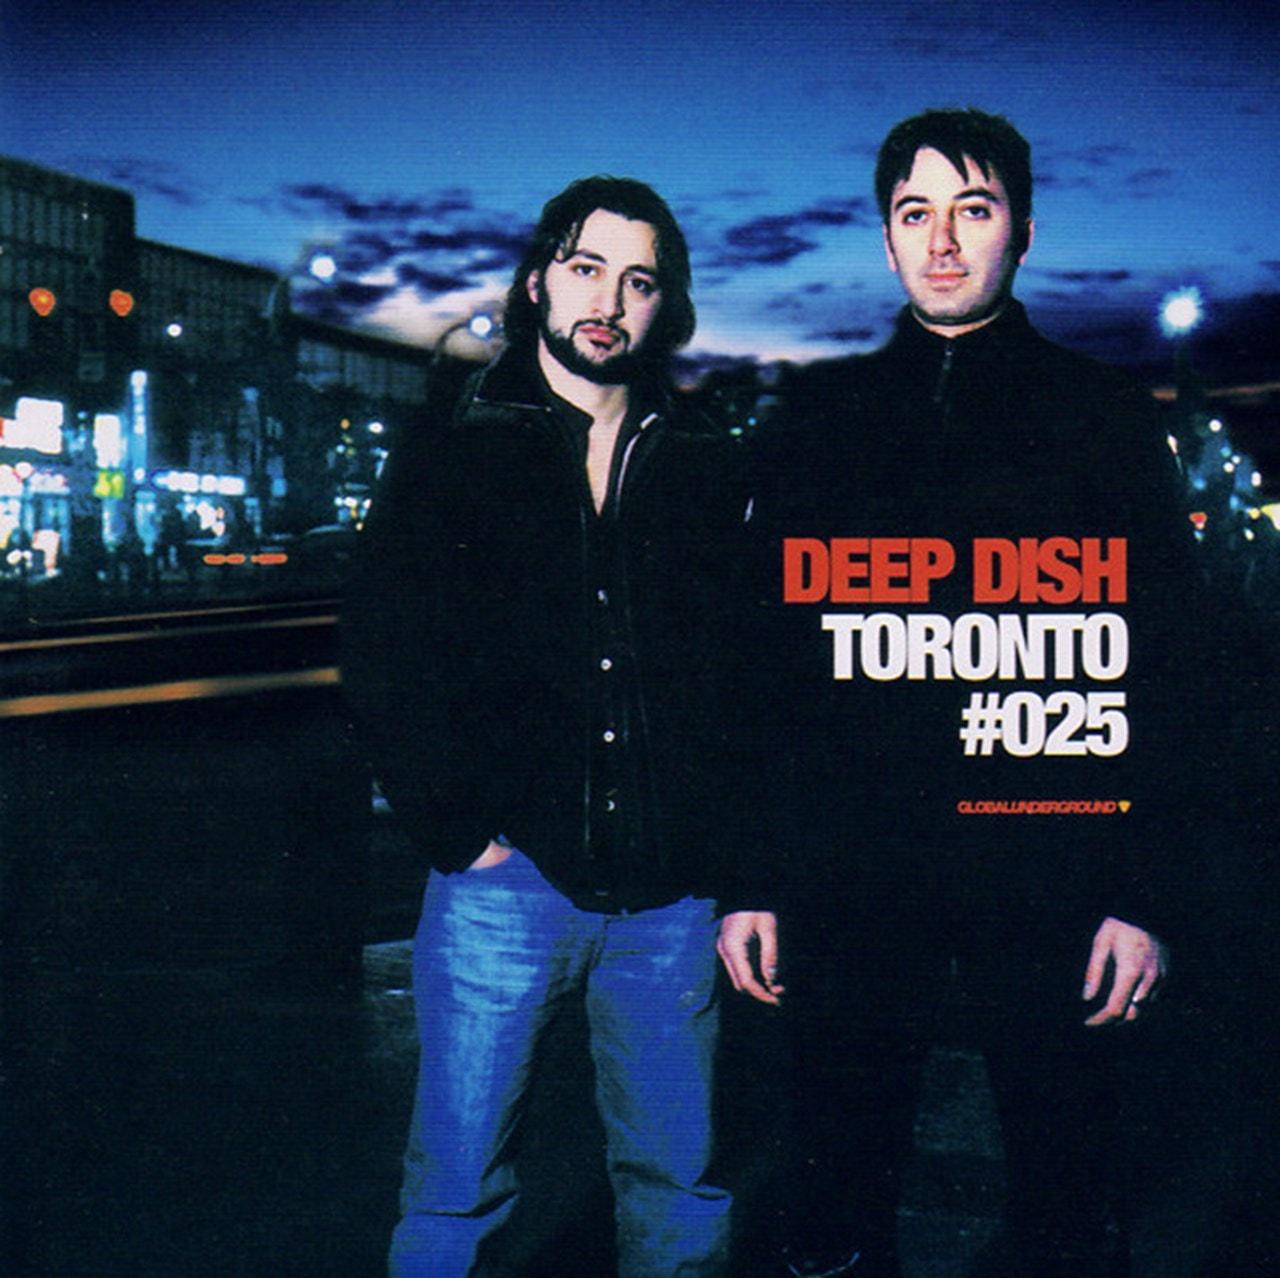 Global Underground 025 Toronto: Deep Dish - 1